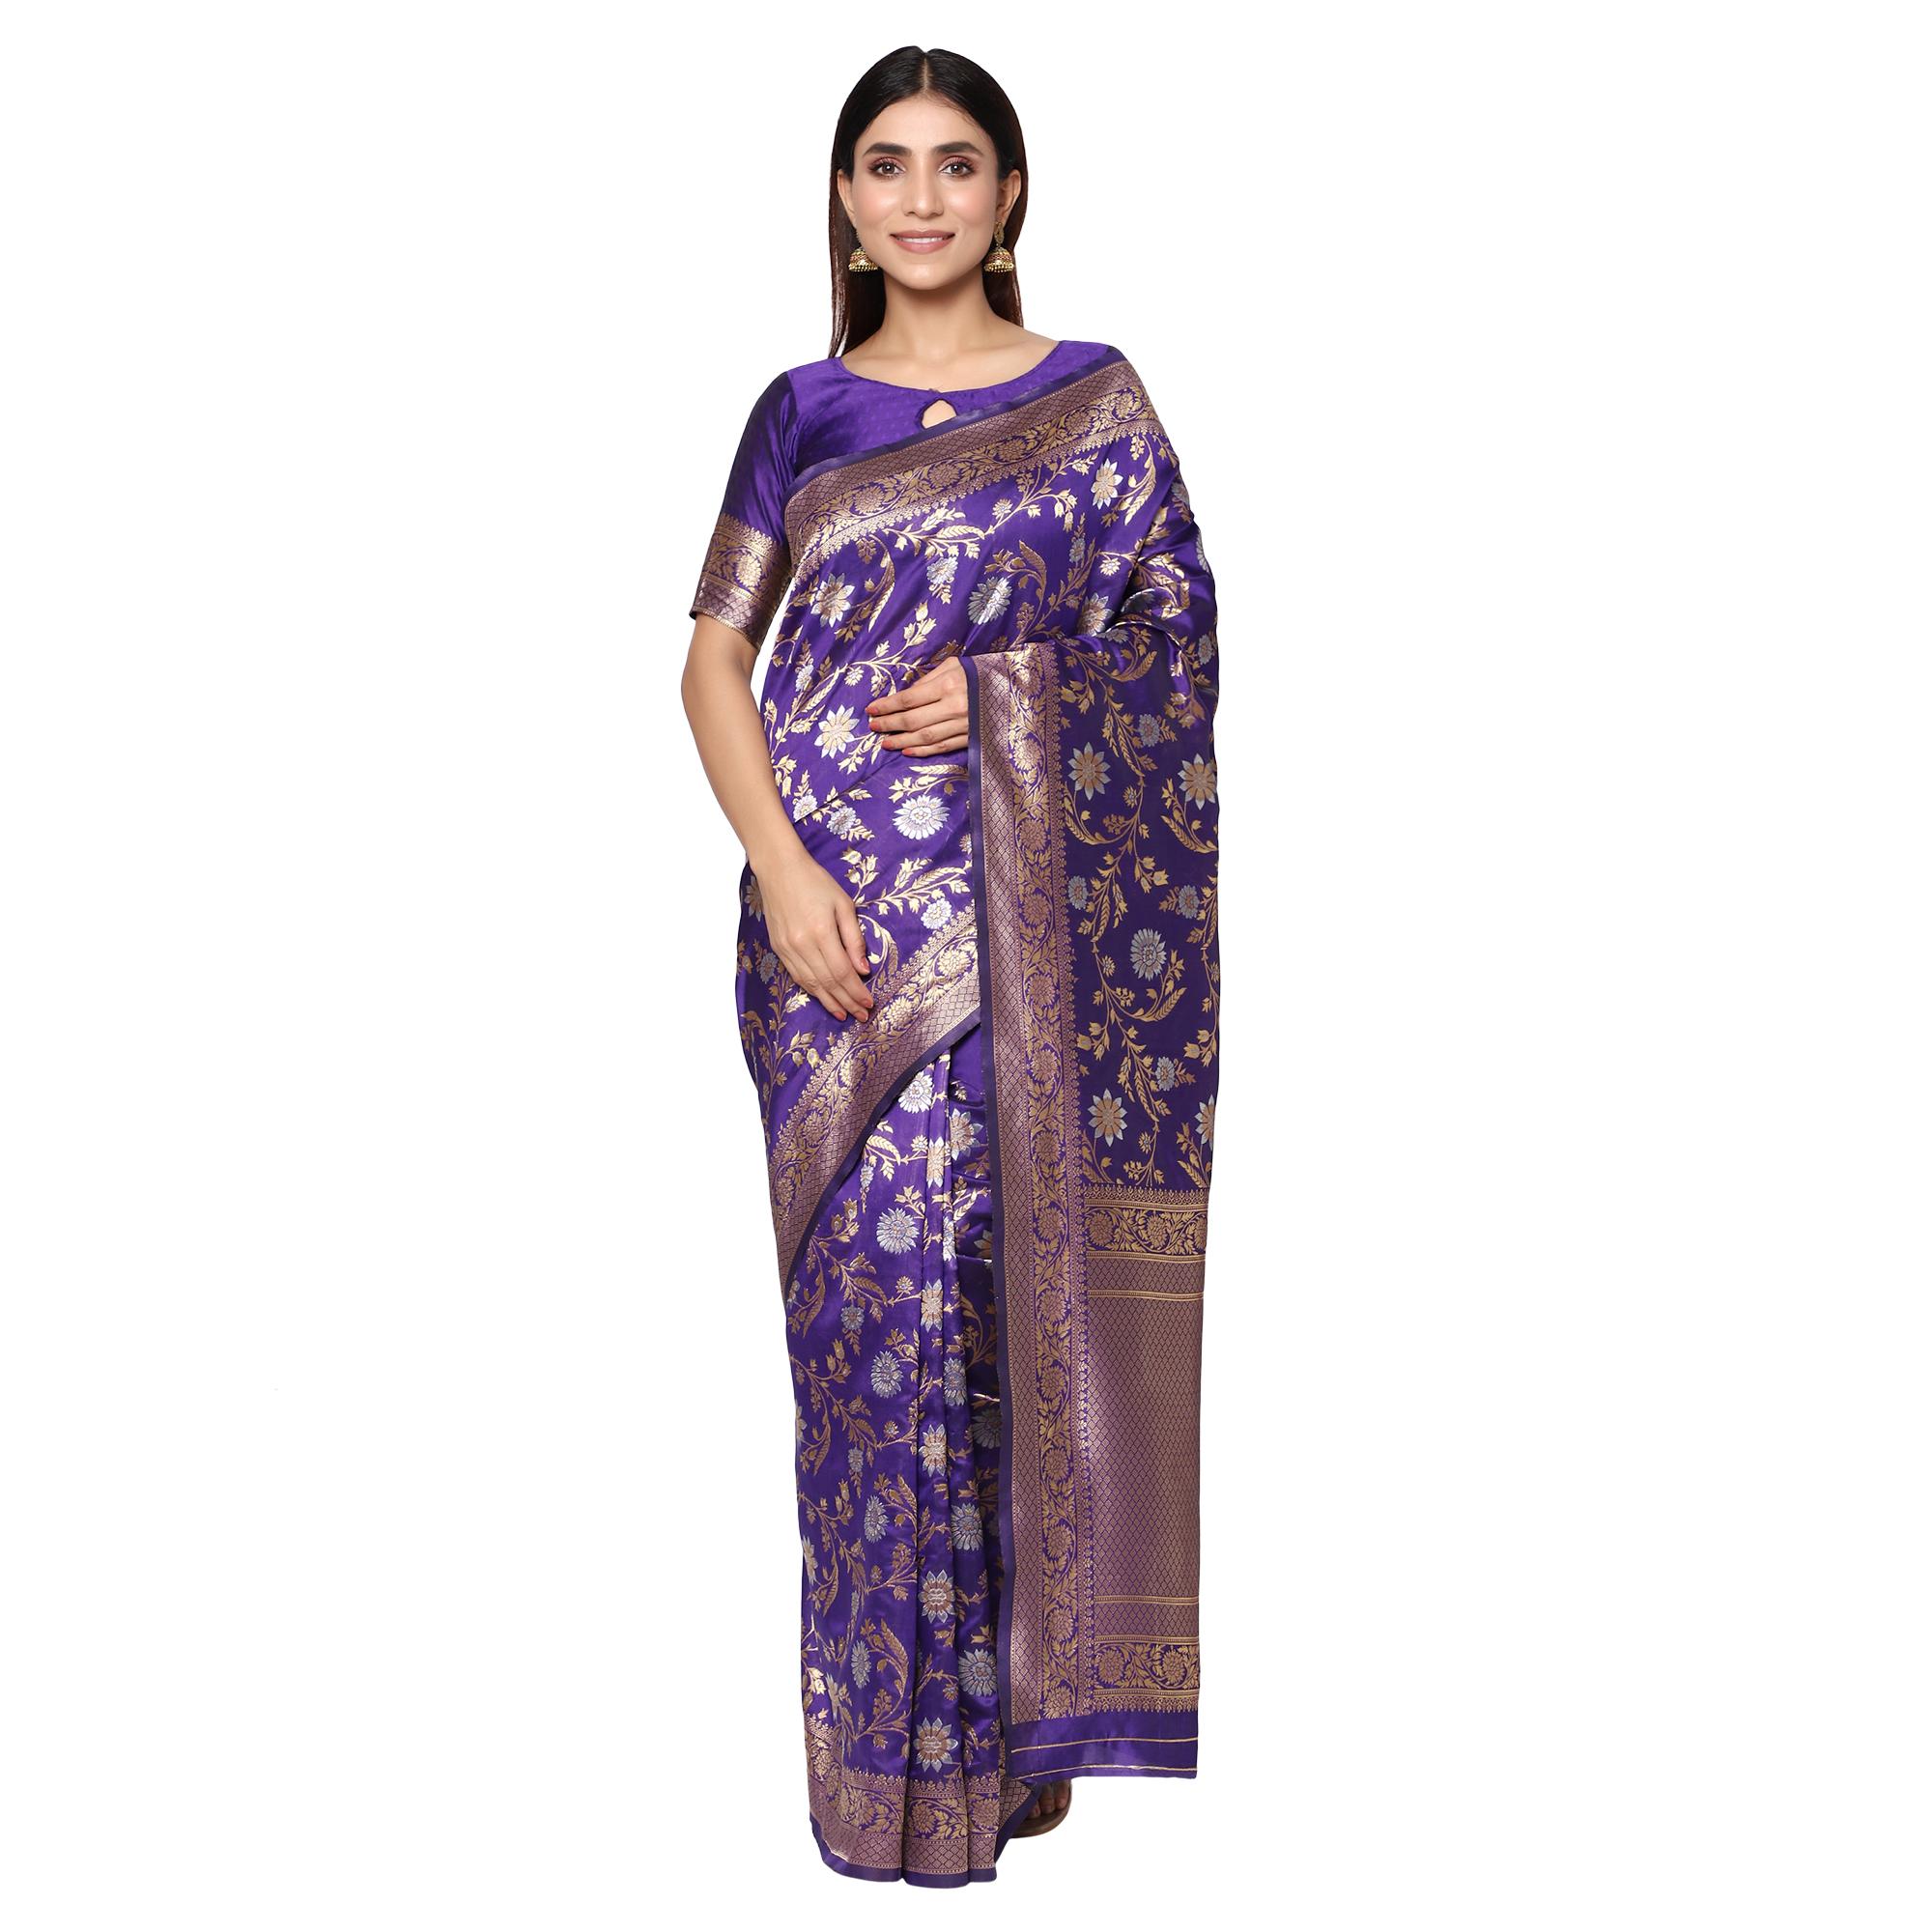 Glemora | Glemora Purple Beautiful Ethnic Wear Silk Blend Banarasi Traditional Saree